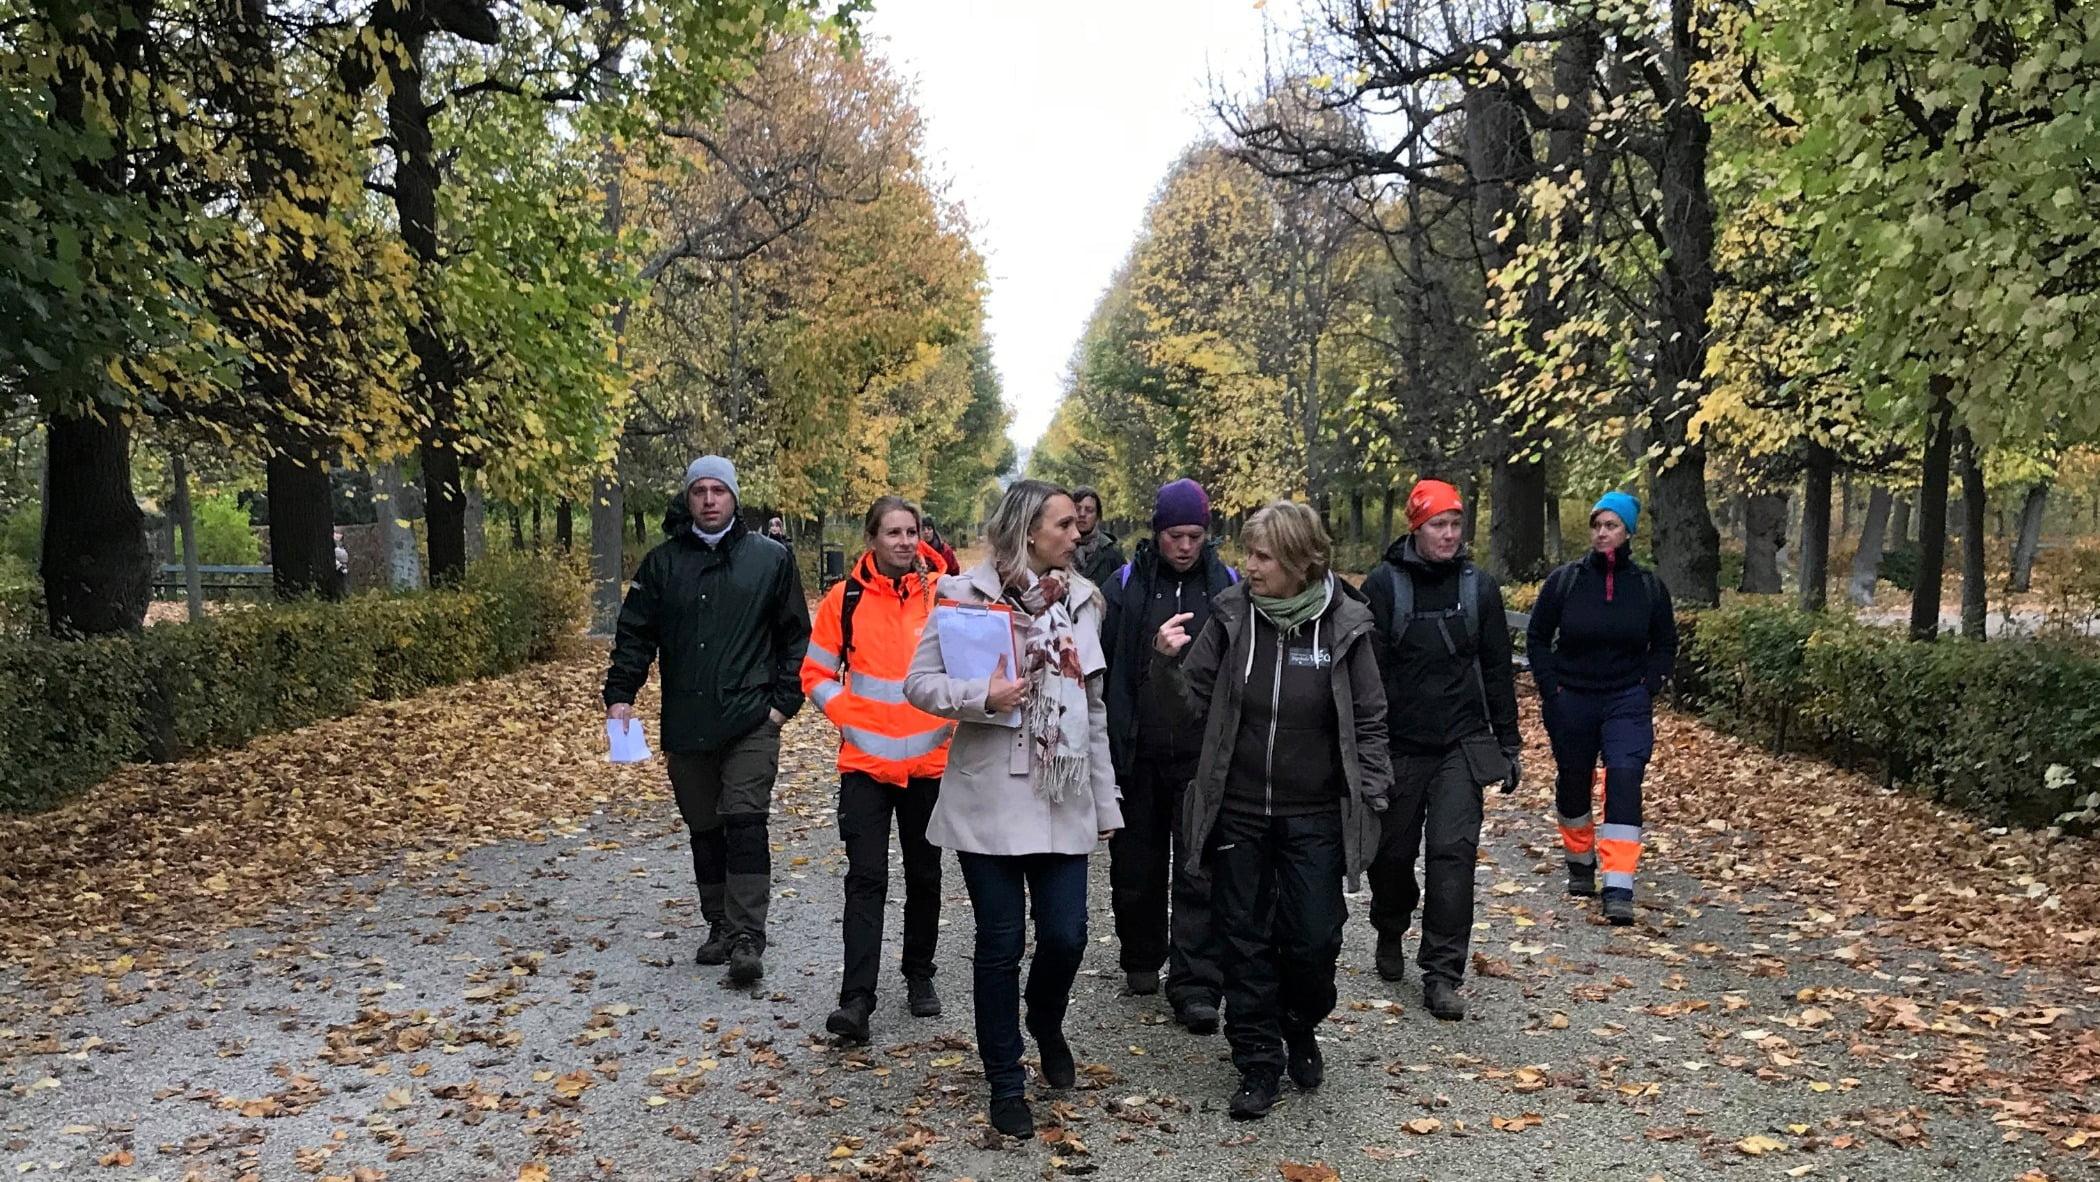 People in nature, Woody plant, Social group, Autumn, Mammal, Leaf, Deciduous, Jacket, Footwear